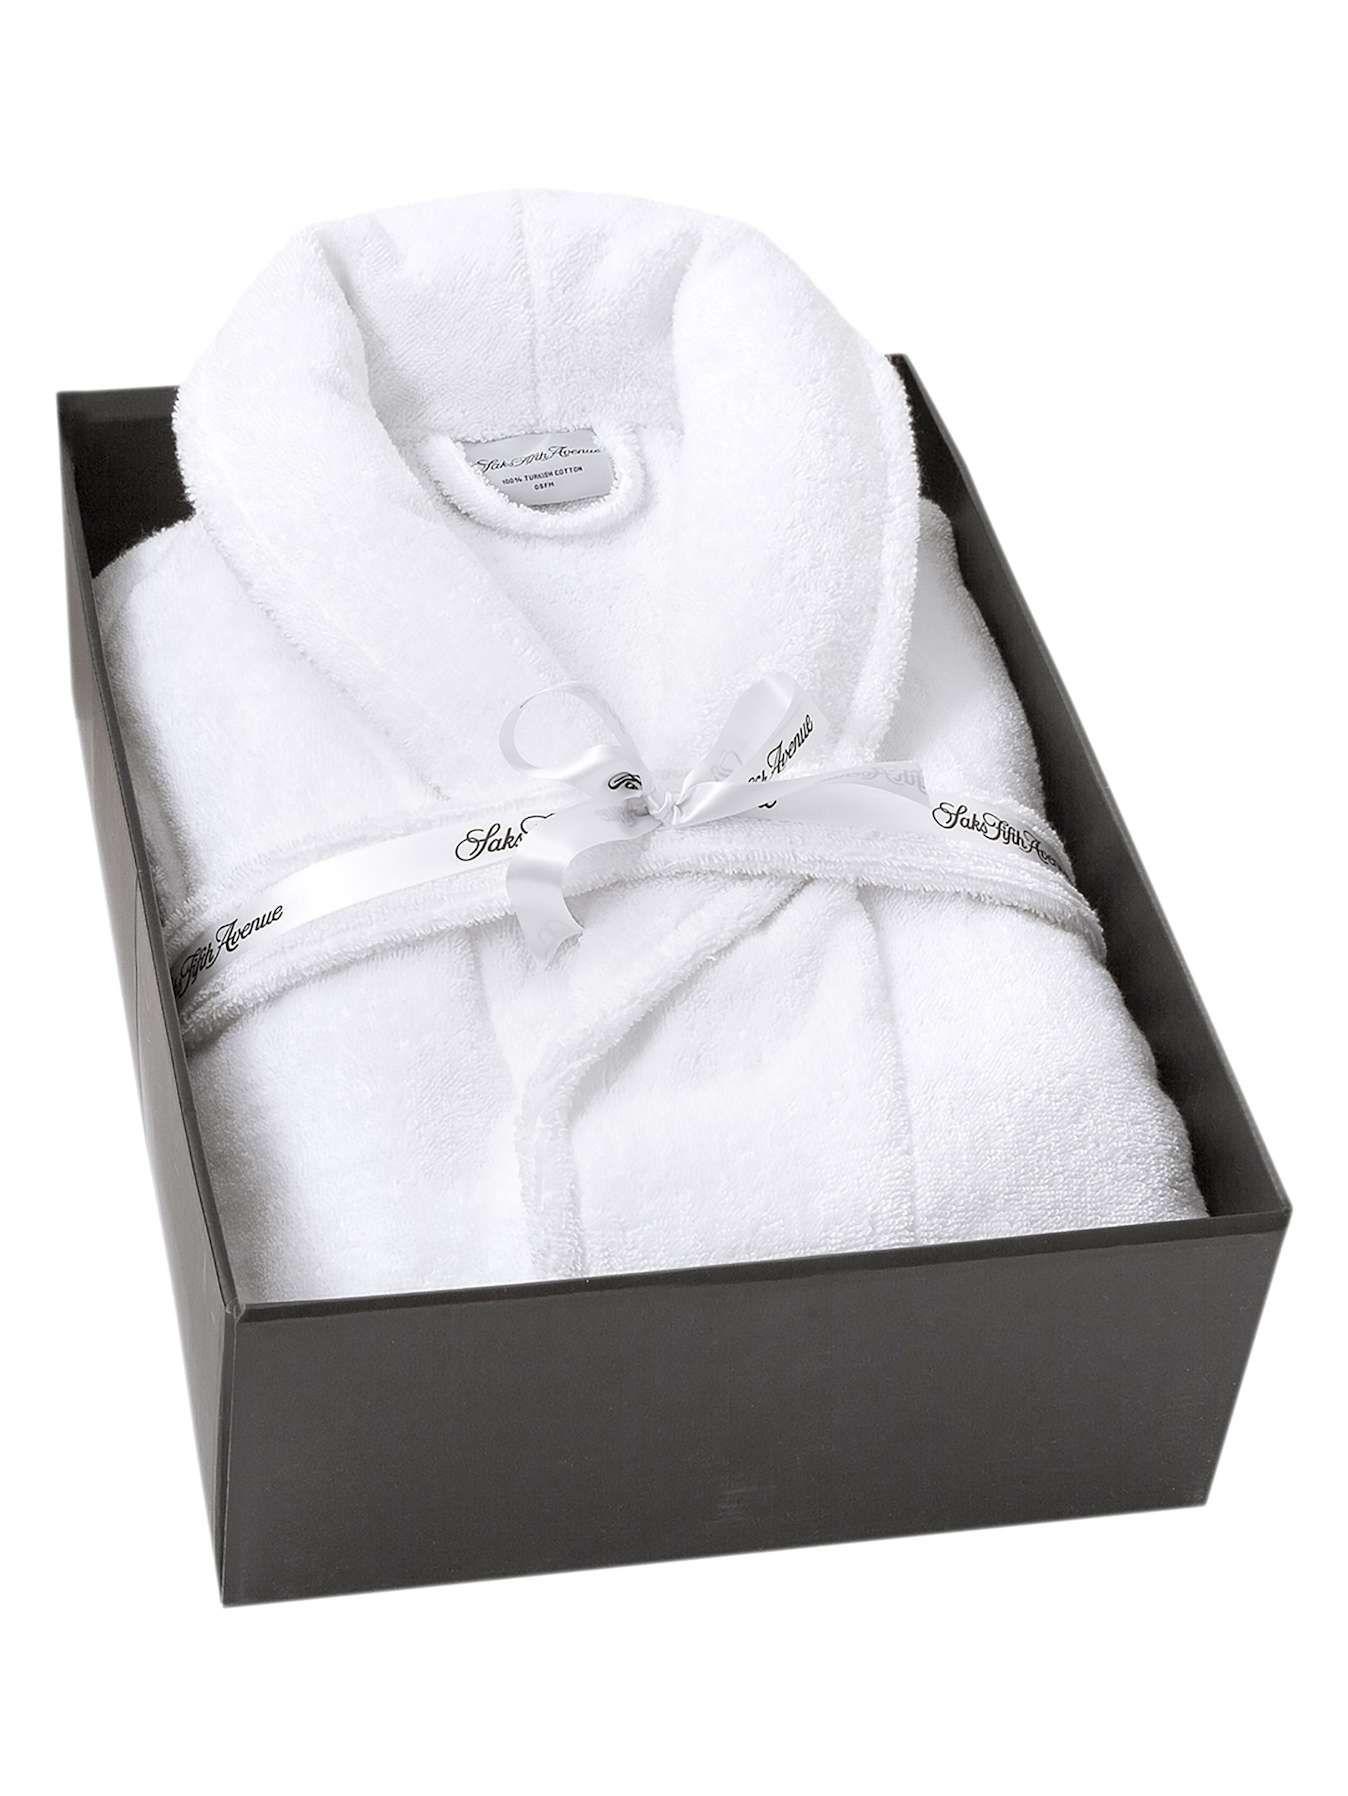 56 Saks Fifth Avenue Luxury Plush Gift Boxed Robe Luxury Plush